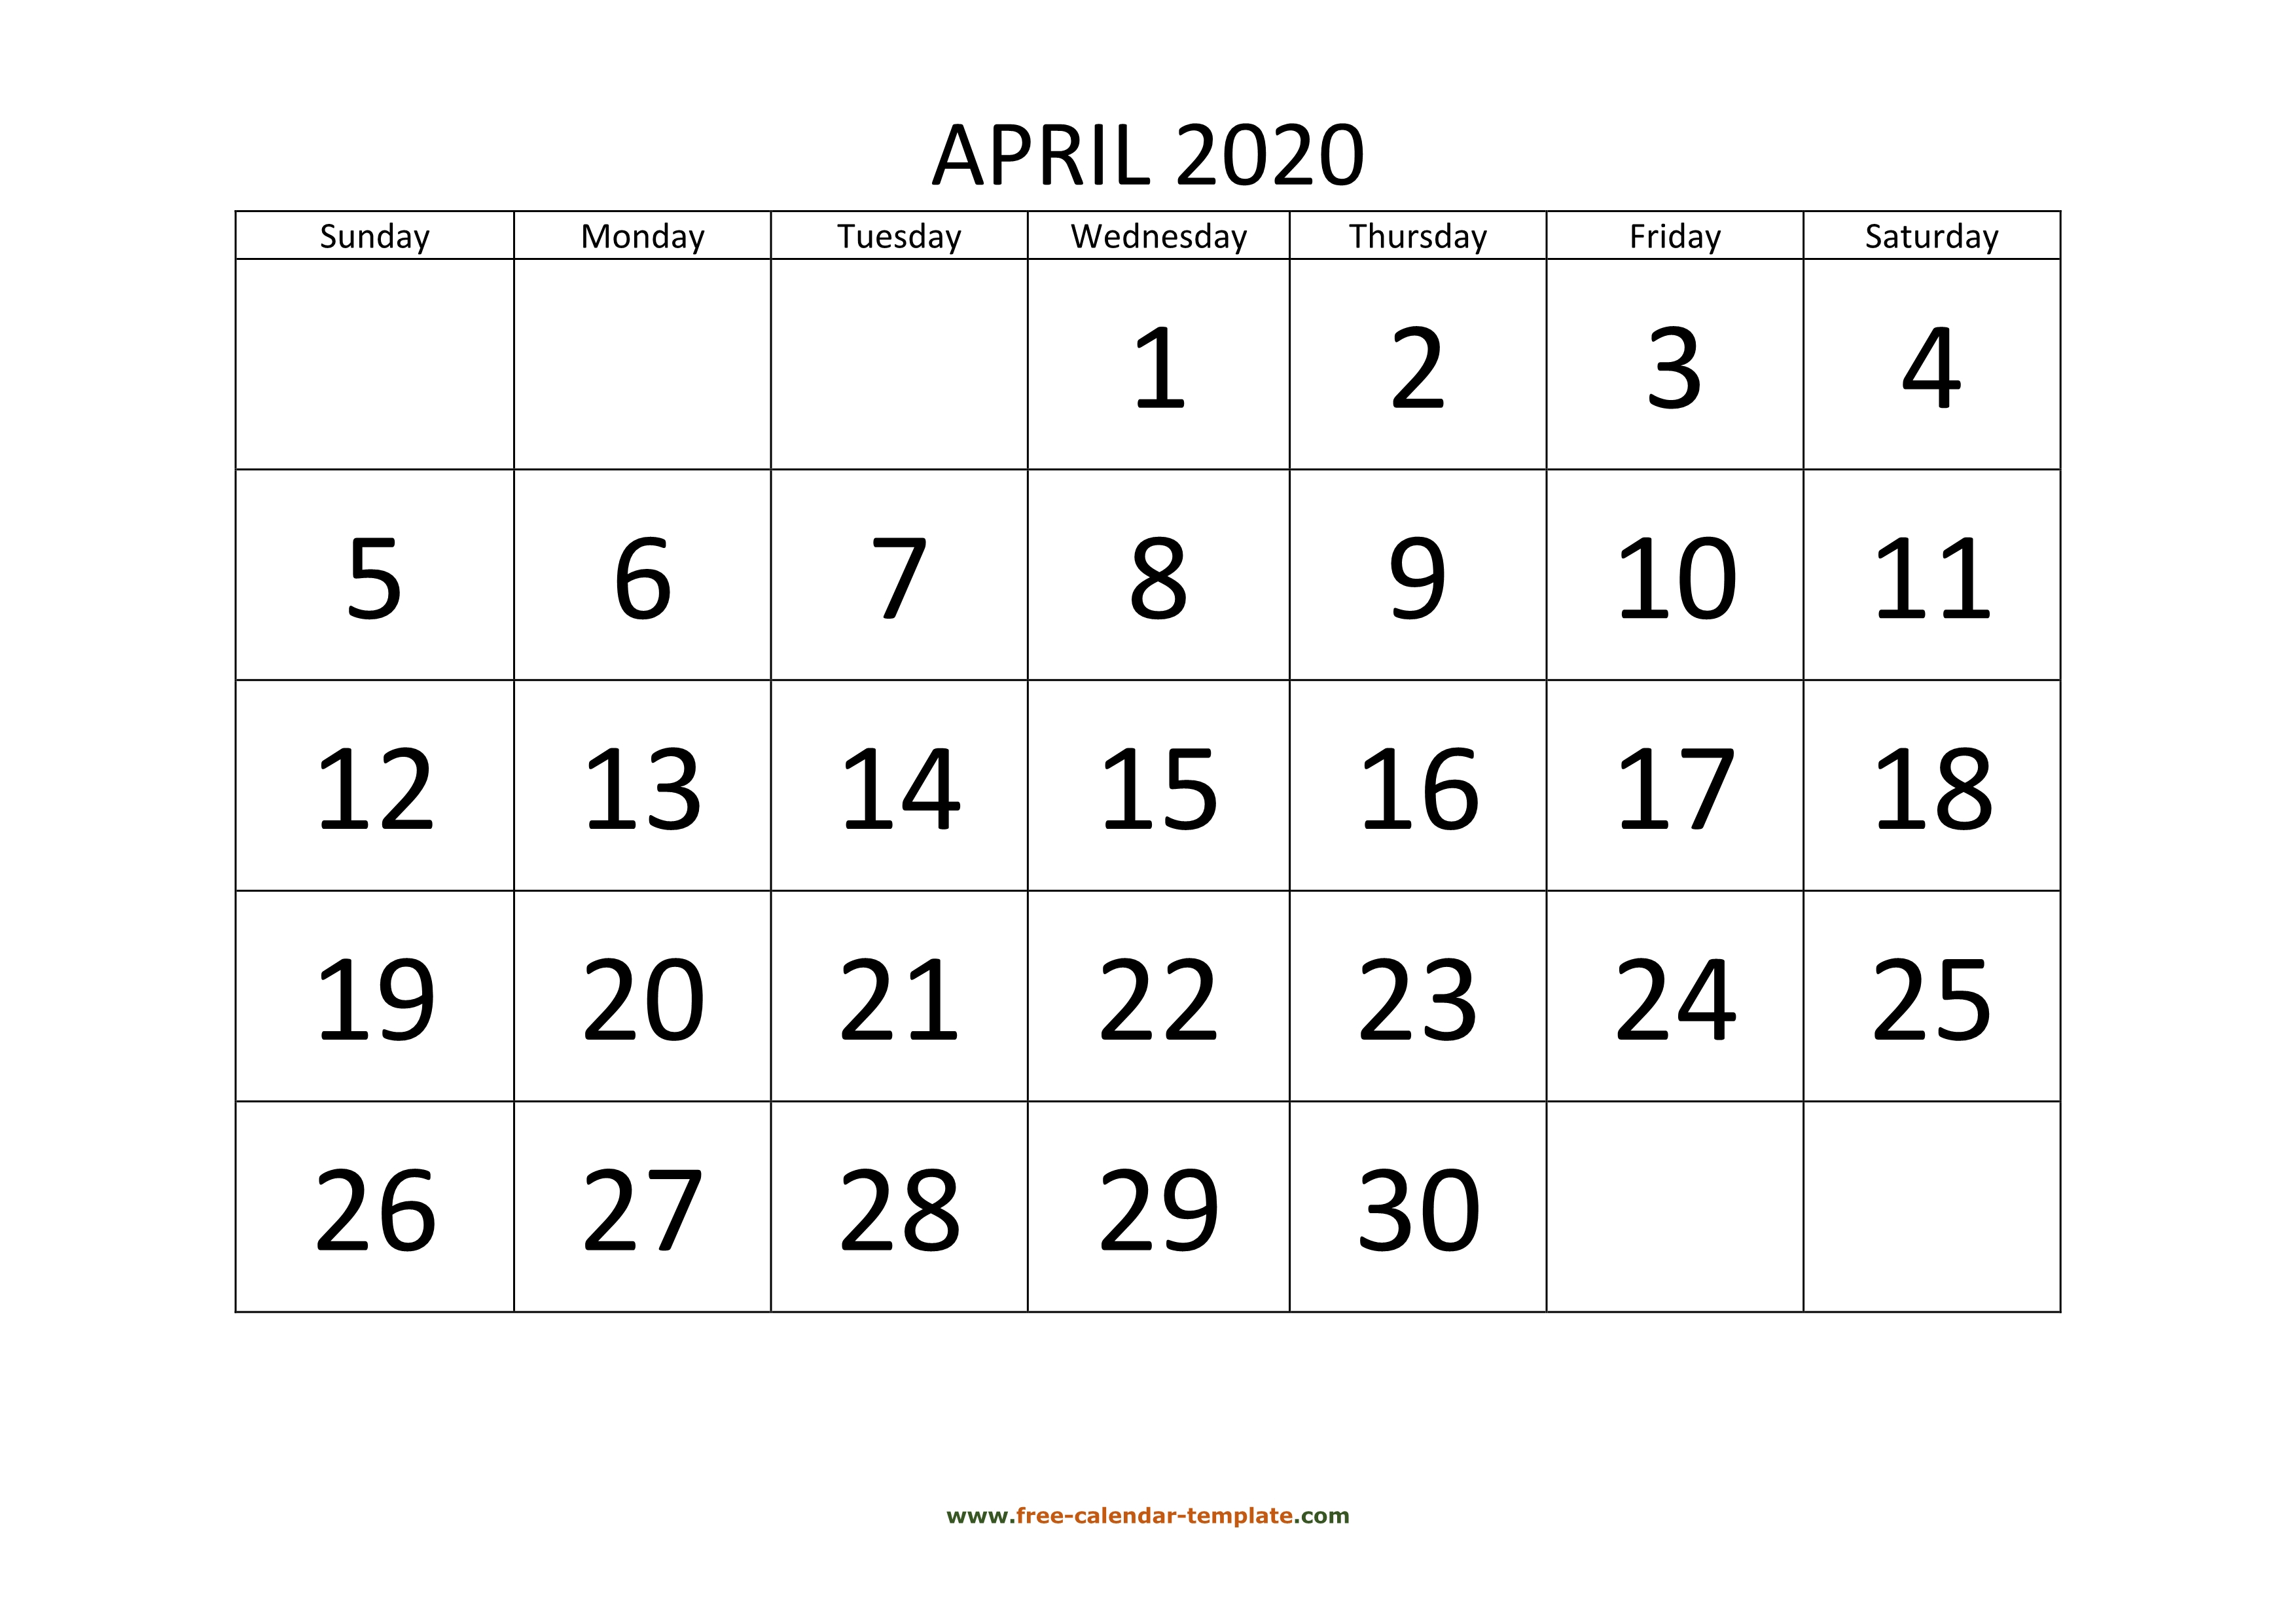 April 2020 Calendar Designed With Large Font (Horizontal for Large Numbers Free Printable Calendar 2020